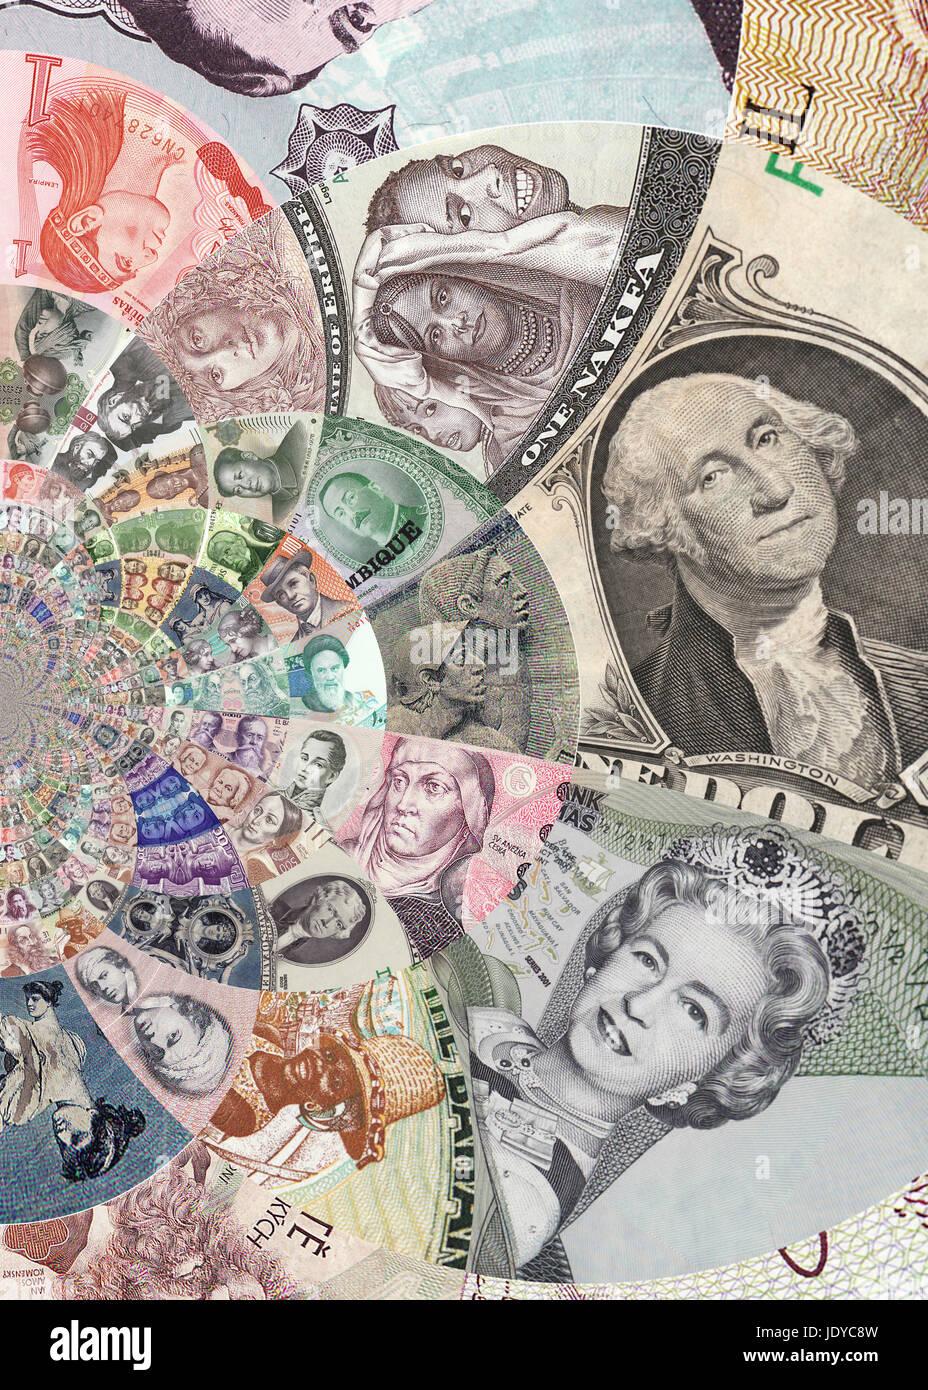 Banknotes - Stock Image